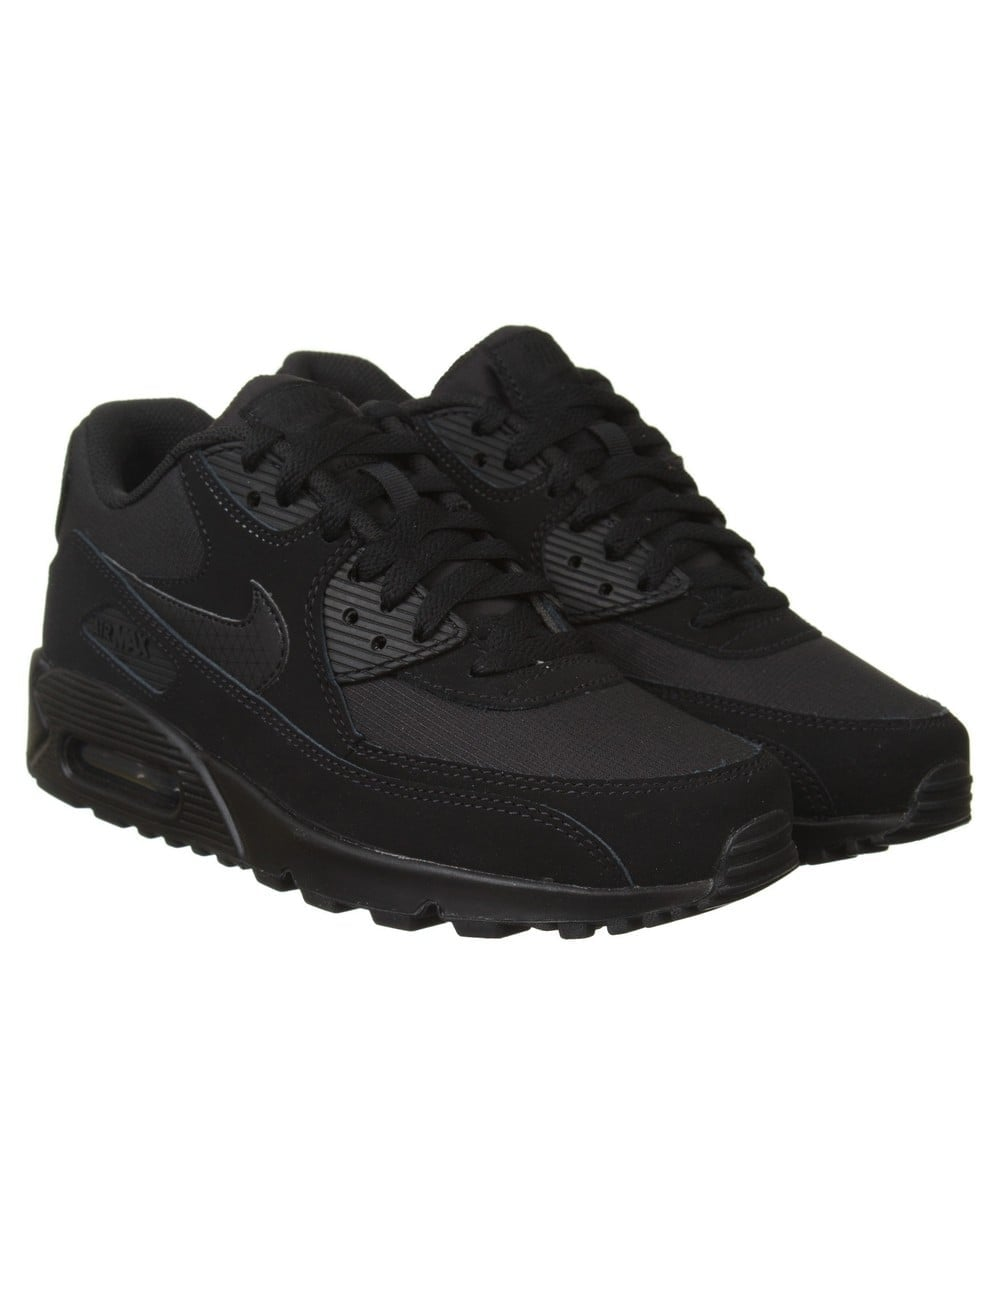 Air Max 90 Essential Shoes BlackBlack